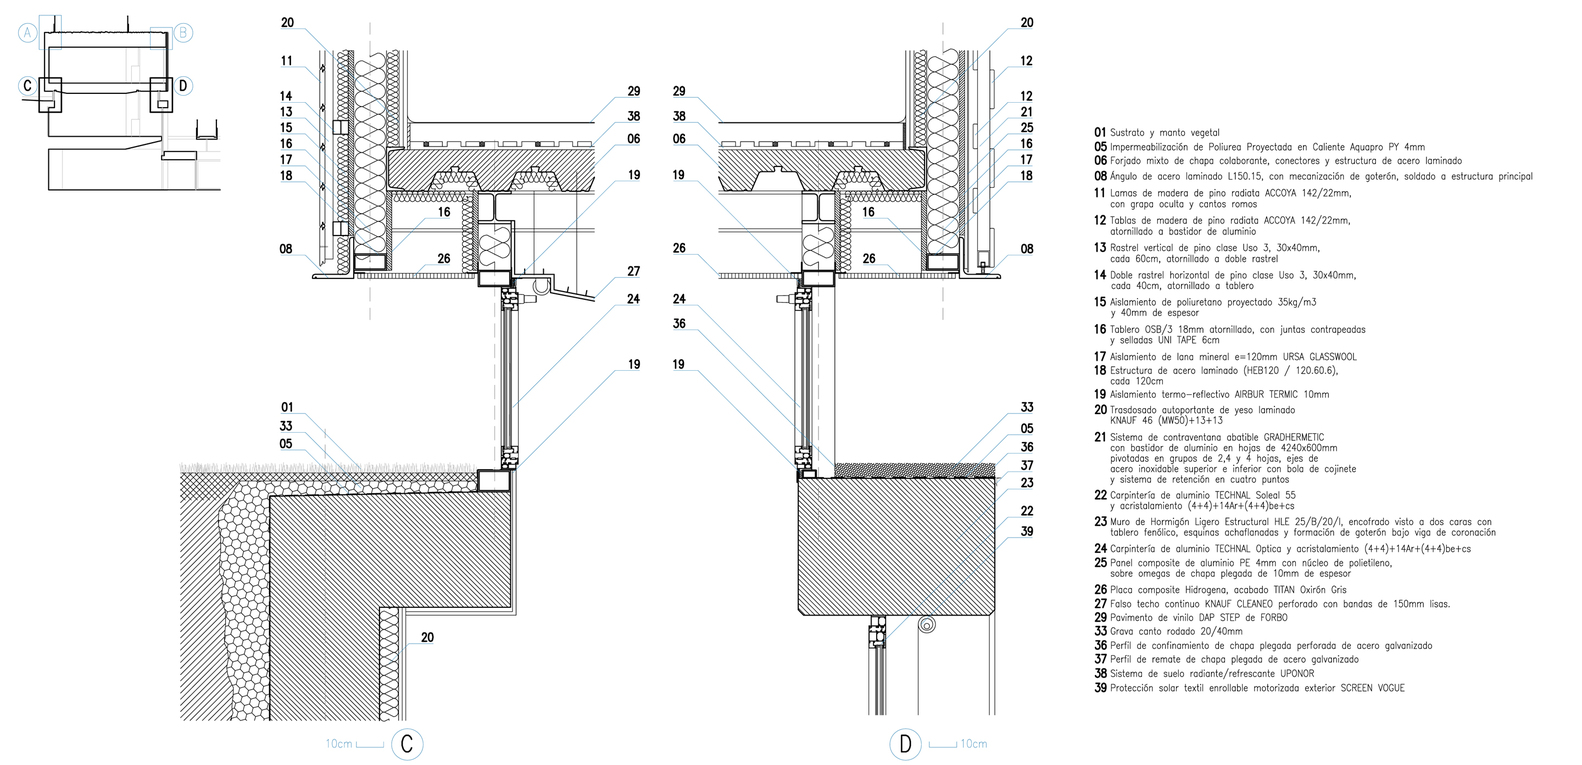 Gallery of Oak House High School Building / Trasbordo Arquitectura - 24